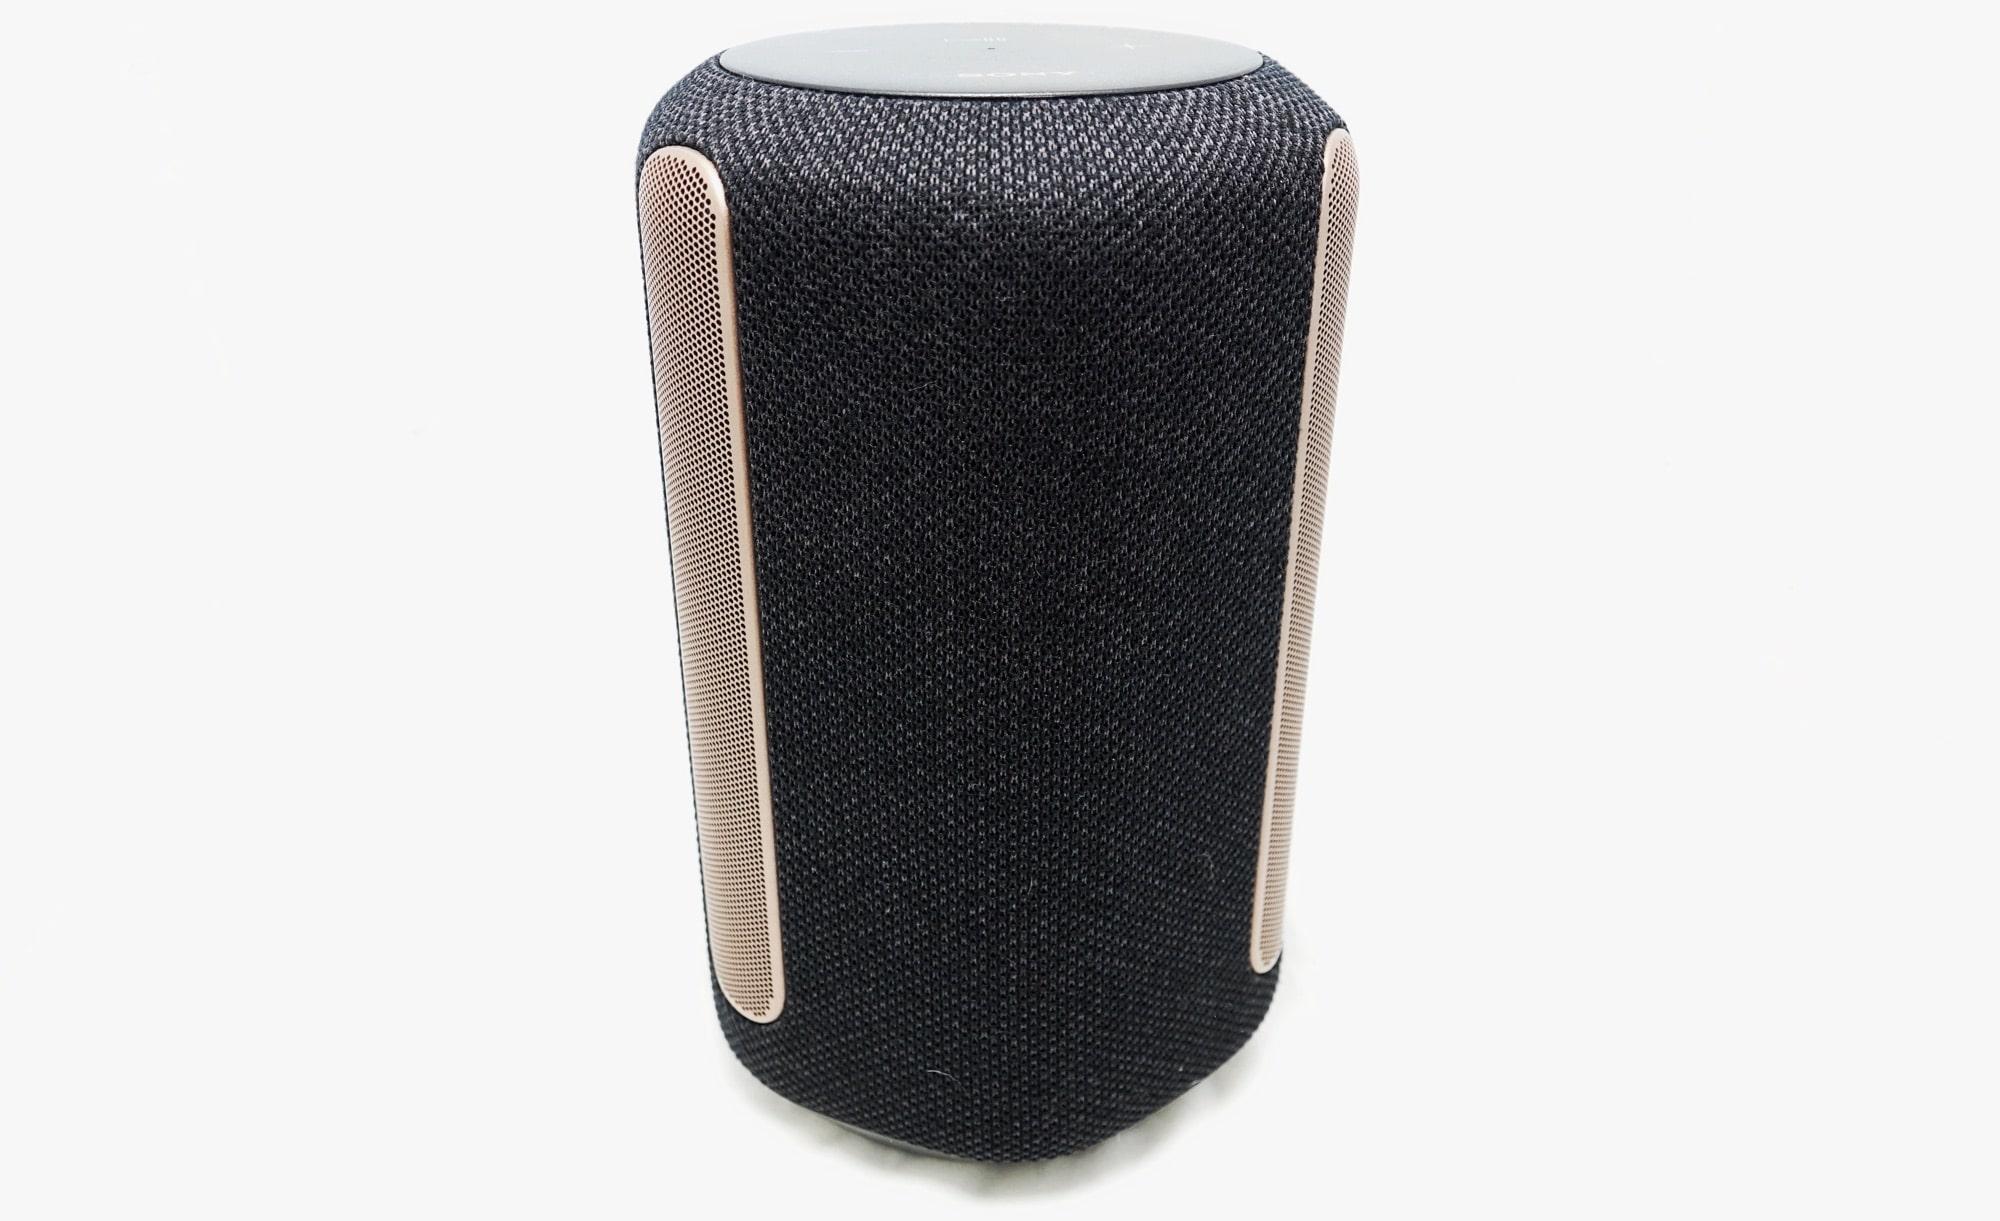 Sony RA3000 360 sound speaker reviewed